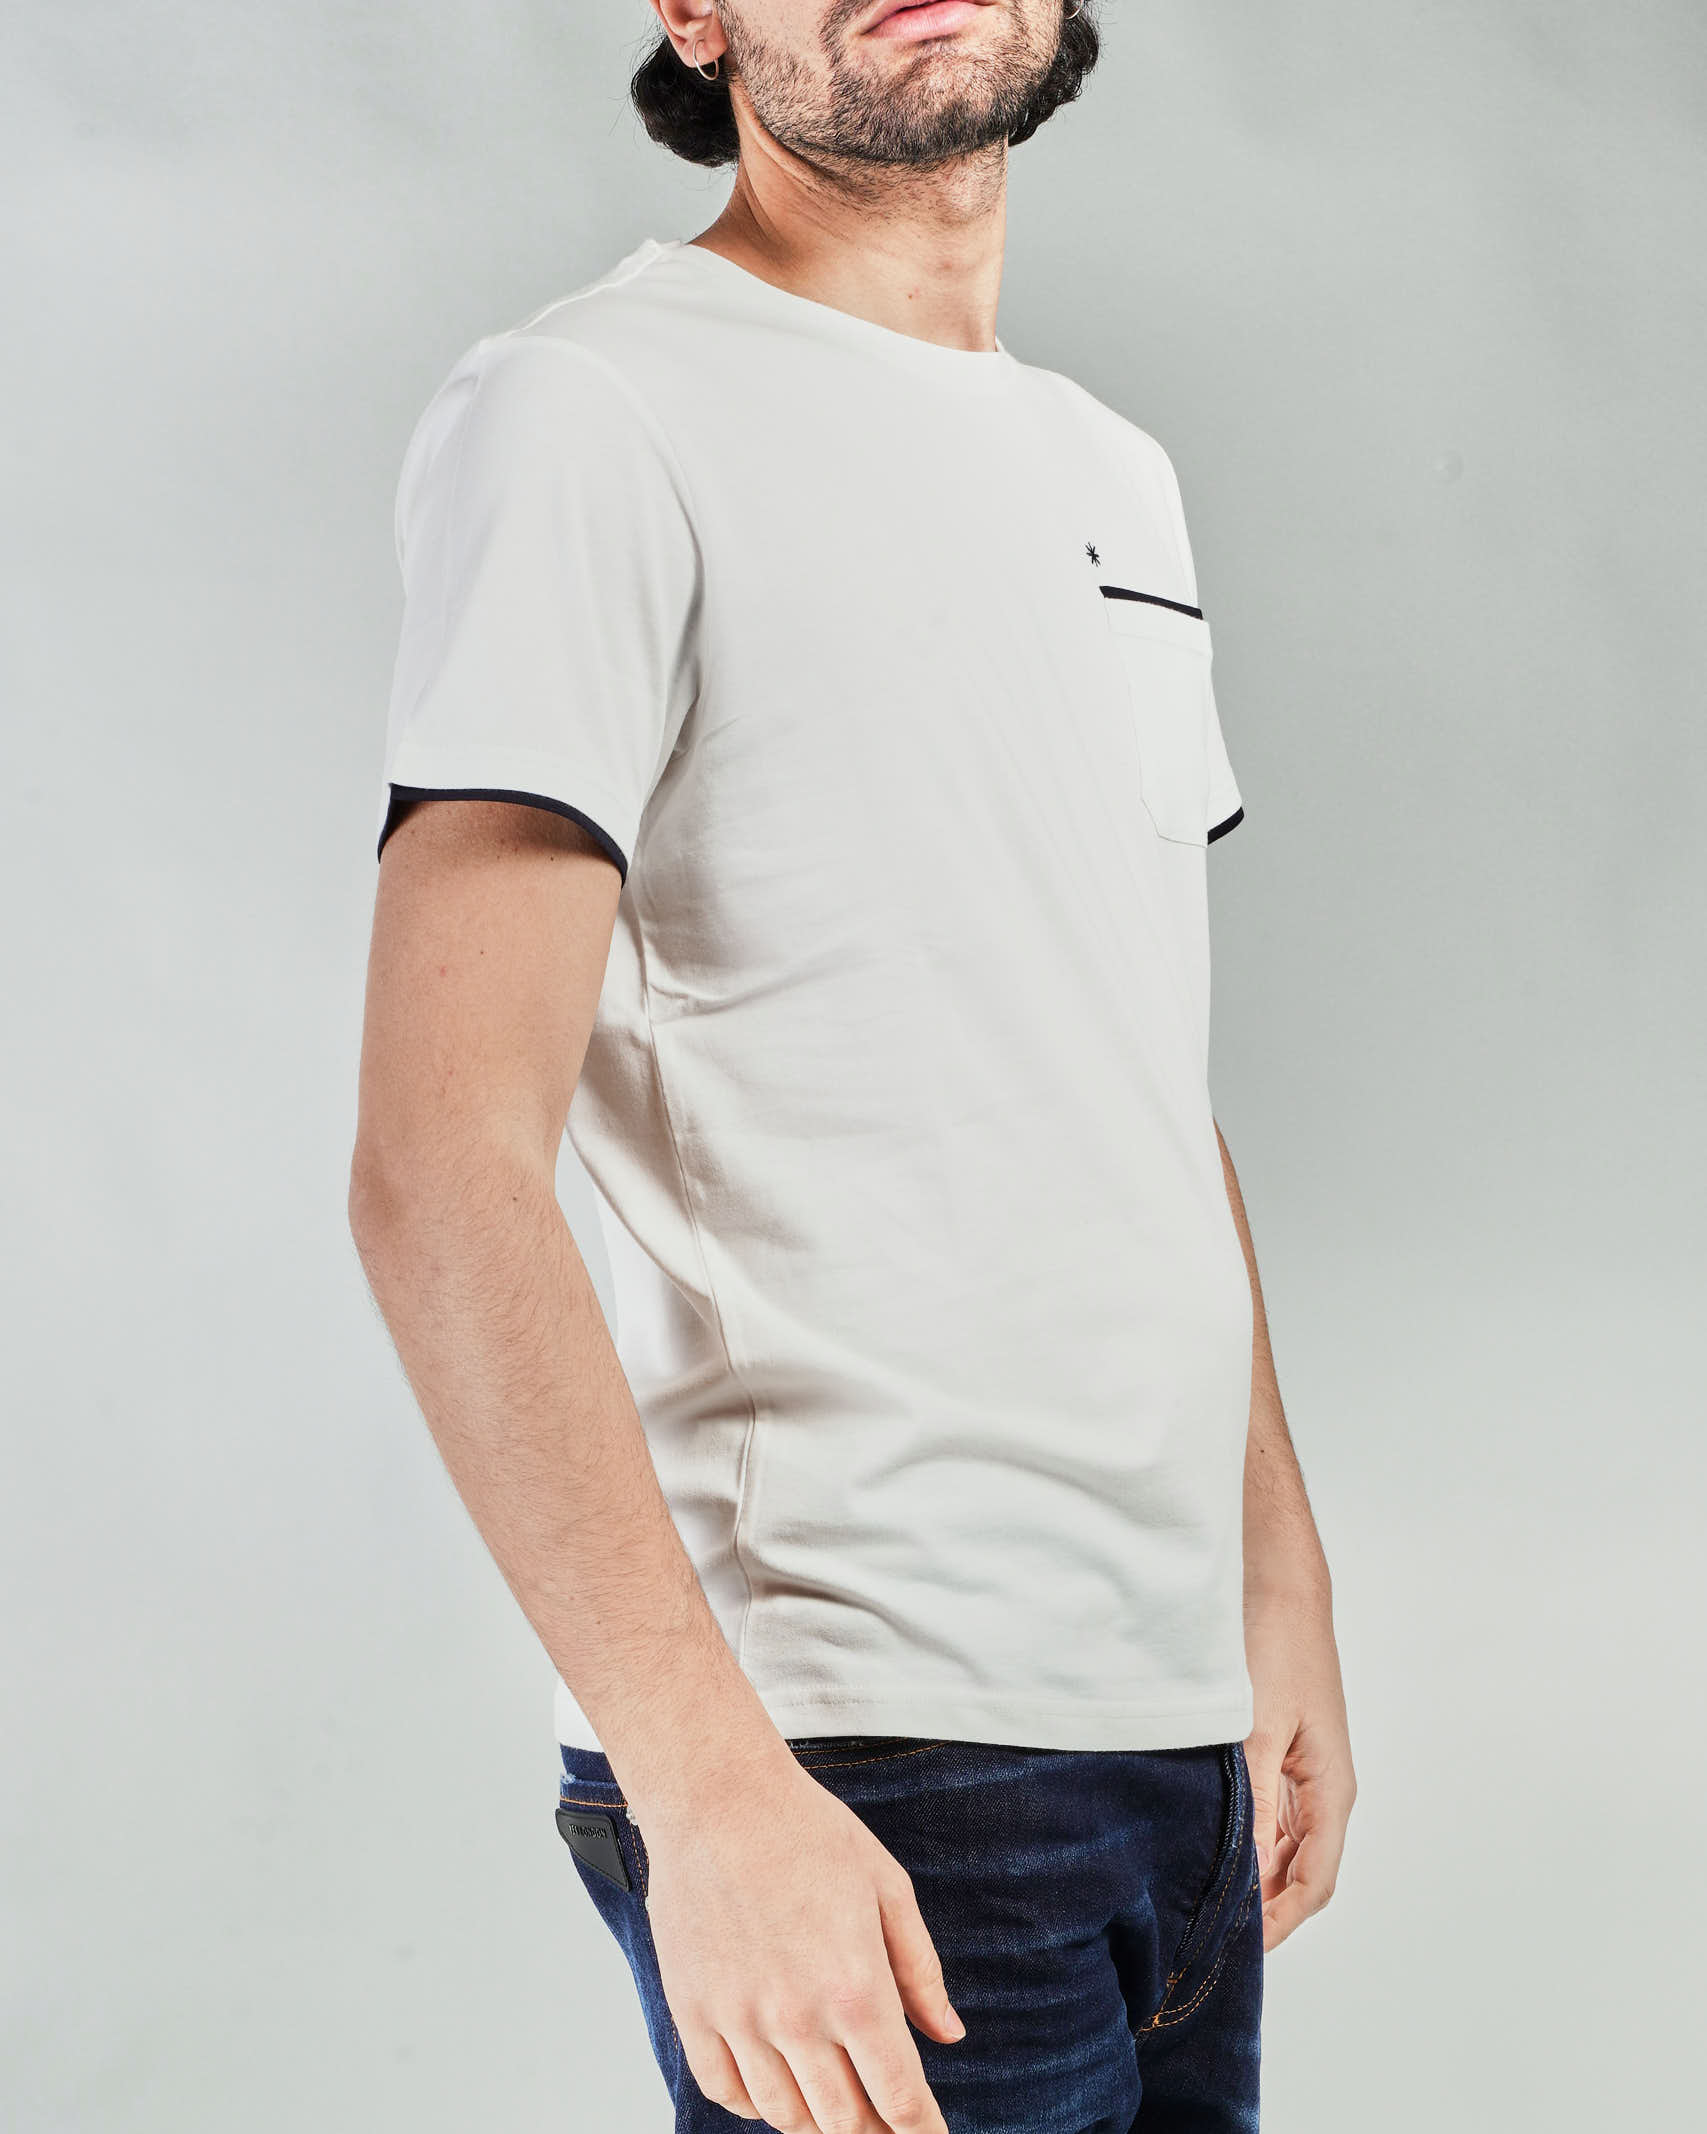 T-shirt con profili a contrasto Manuel Ritz MANUEL RITZ | T-shirt | 3032M5512132933